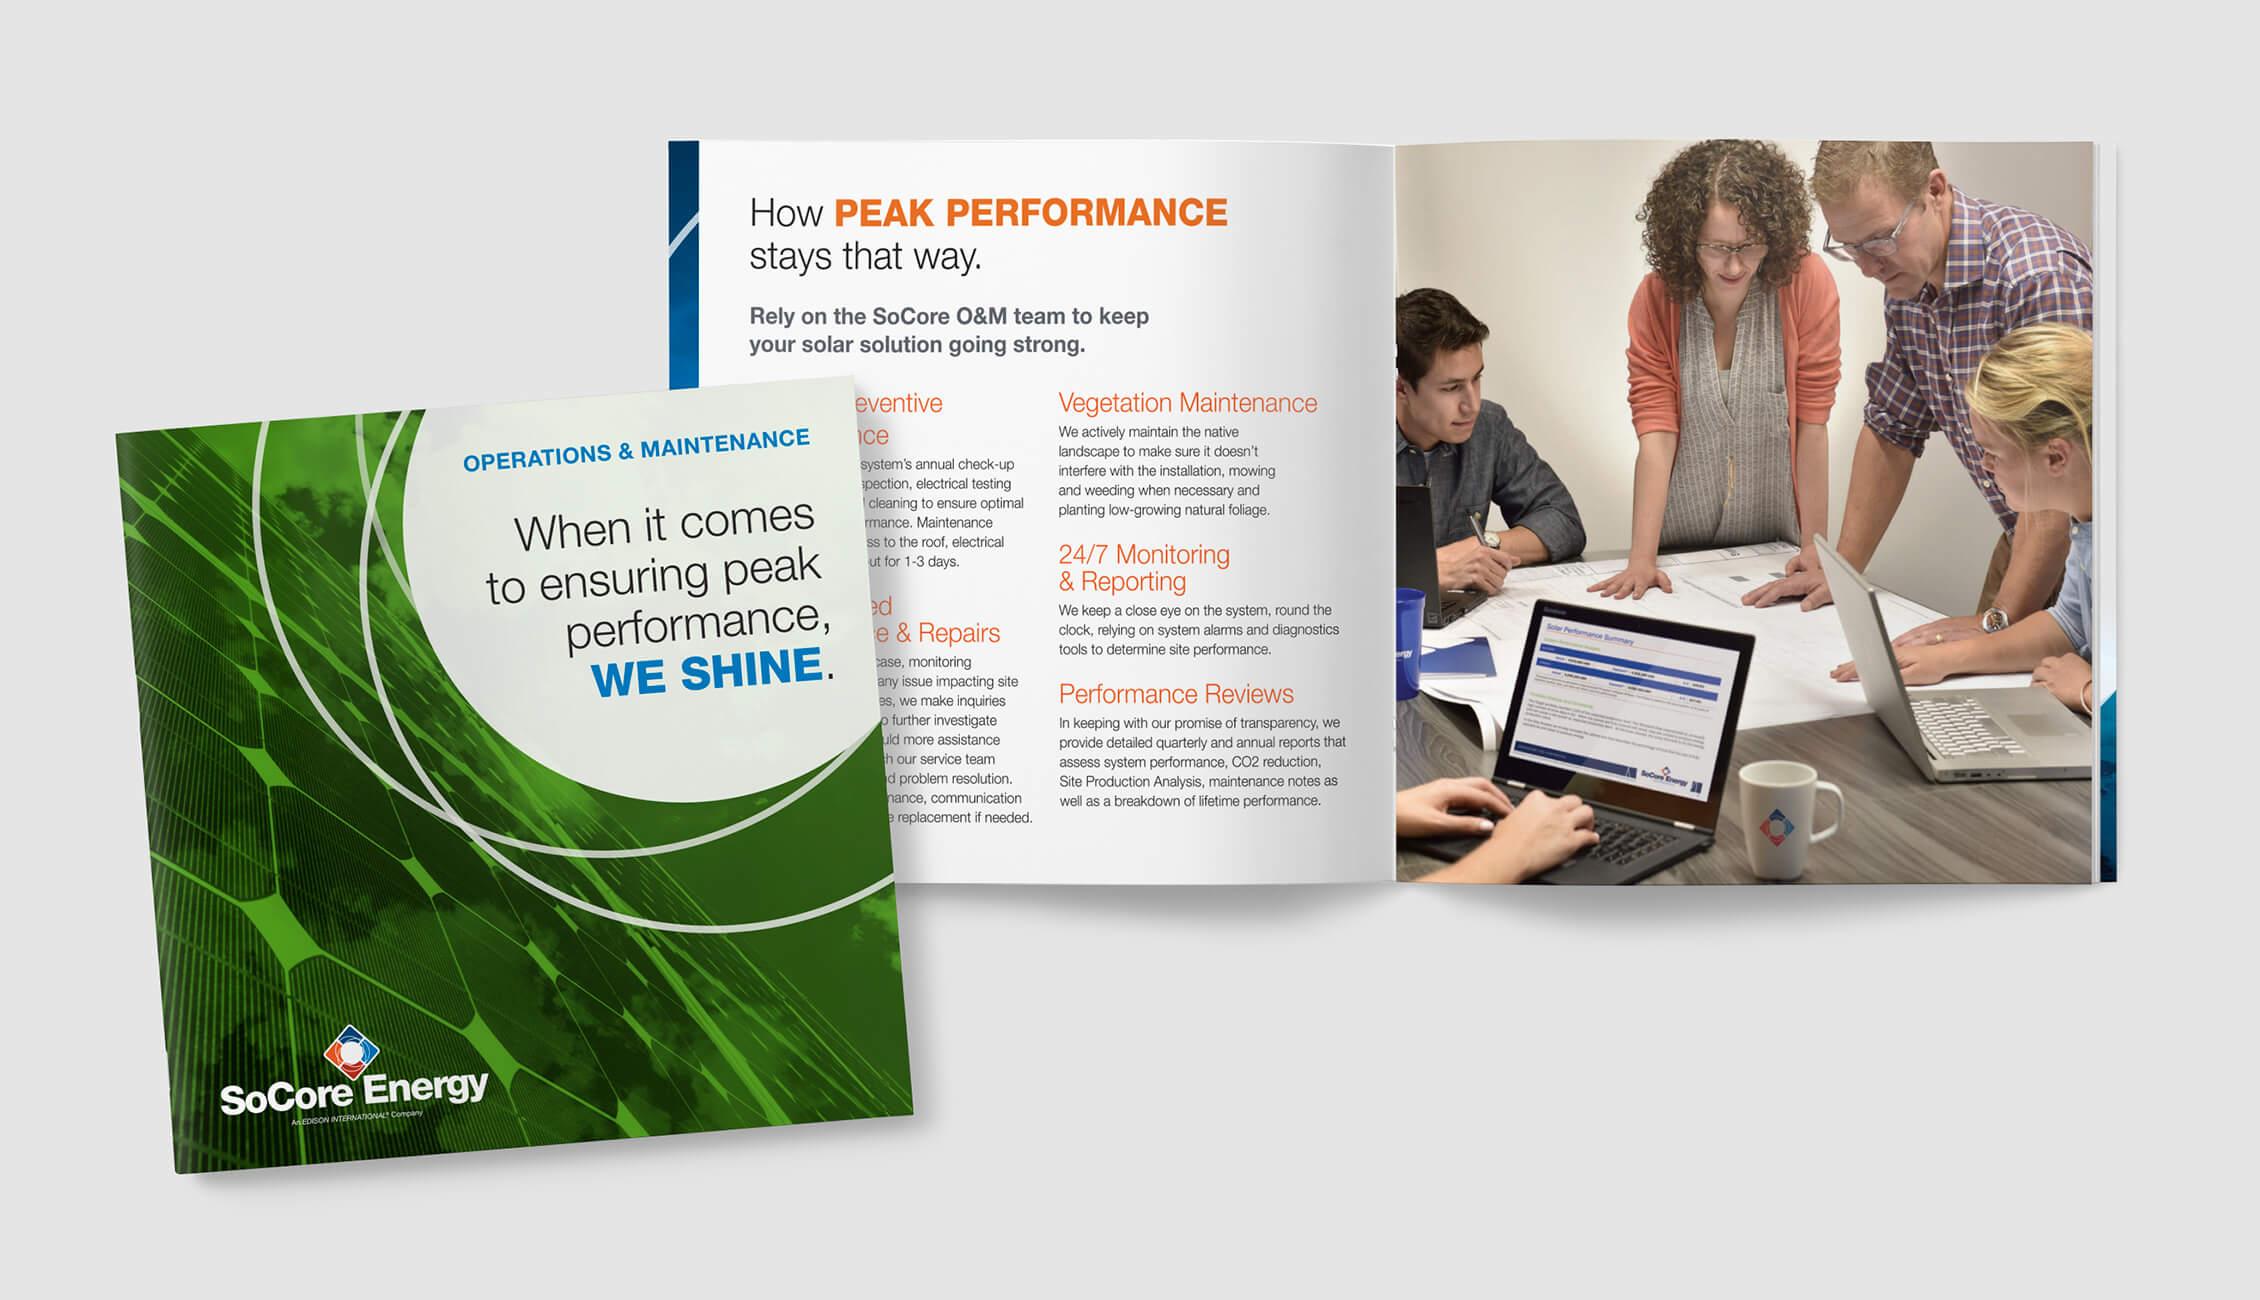 SoCore O&M Brochure Image